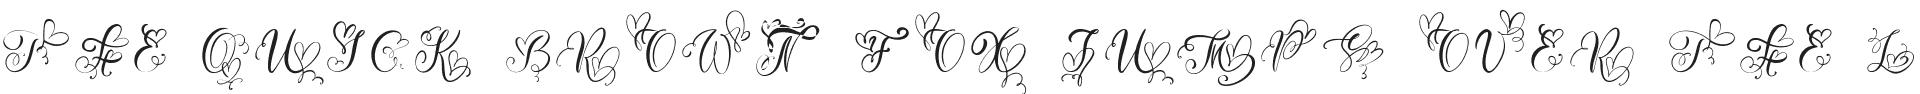 Best Valentines Day Font in 2021. Initial Valentine Display Font! - image.php?font=InitialValentine Regular